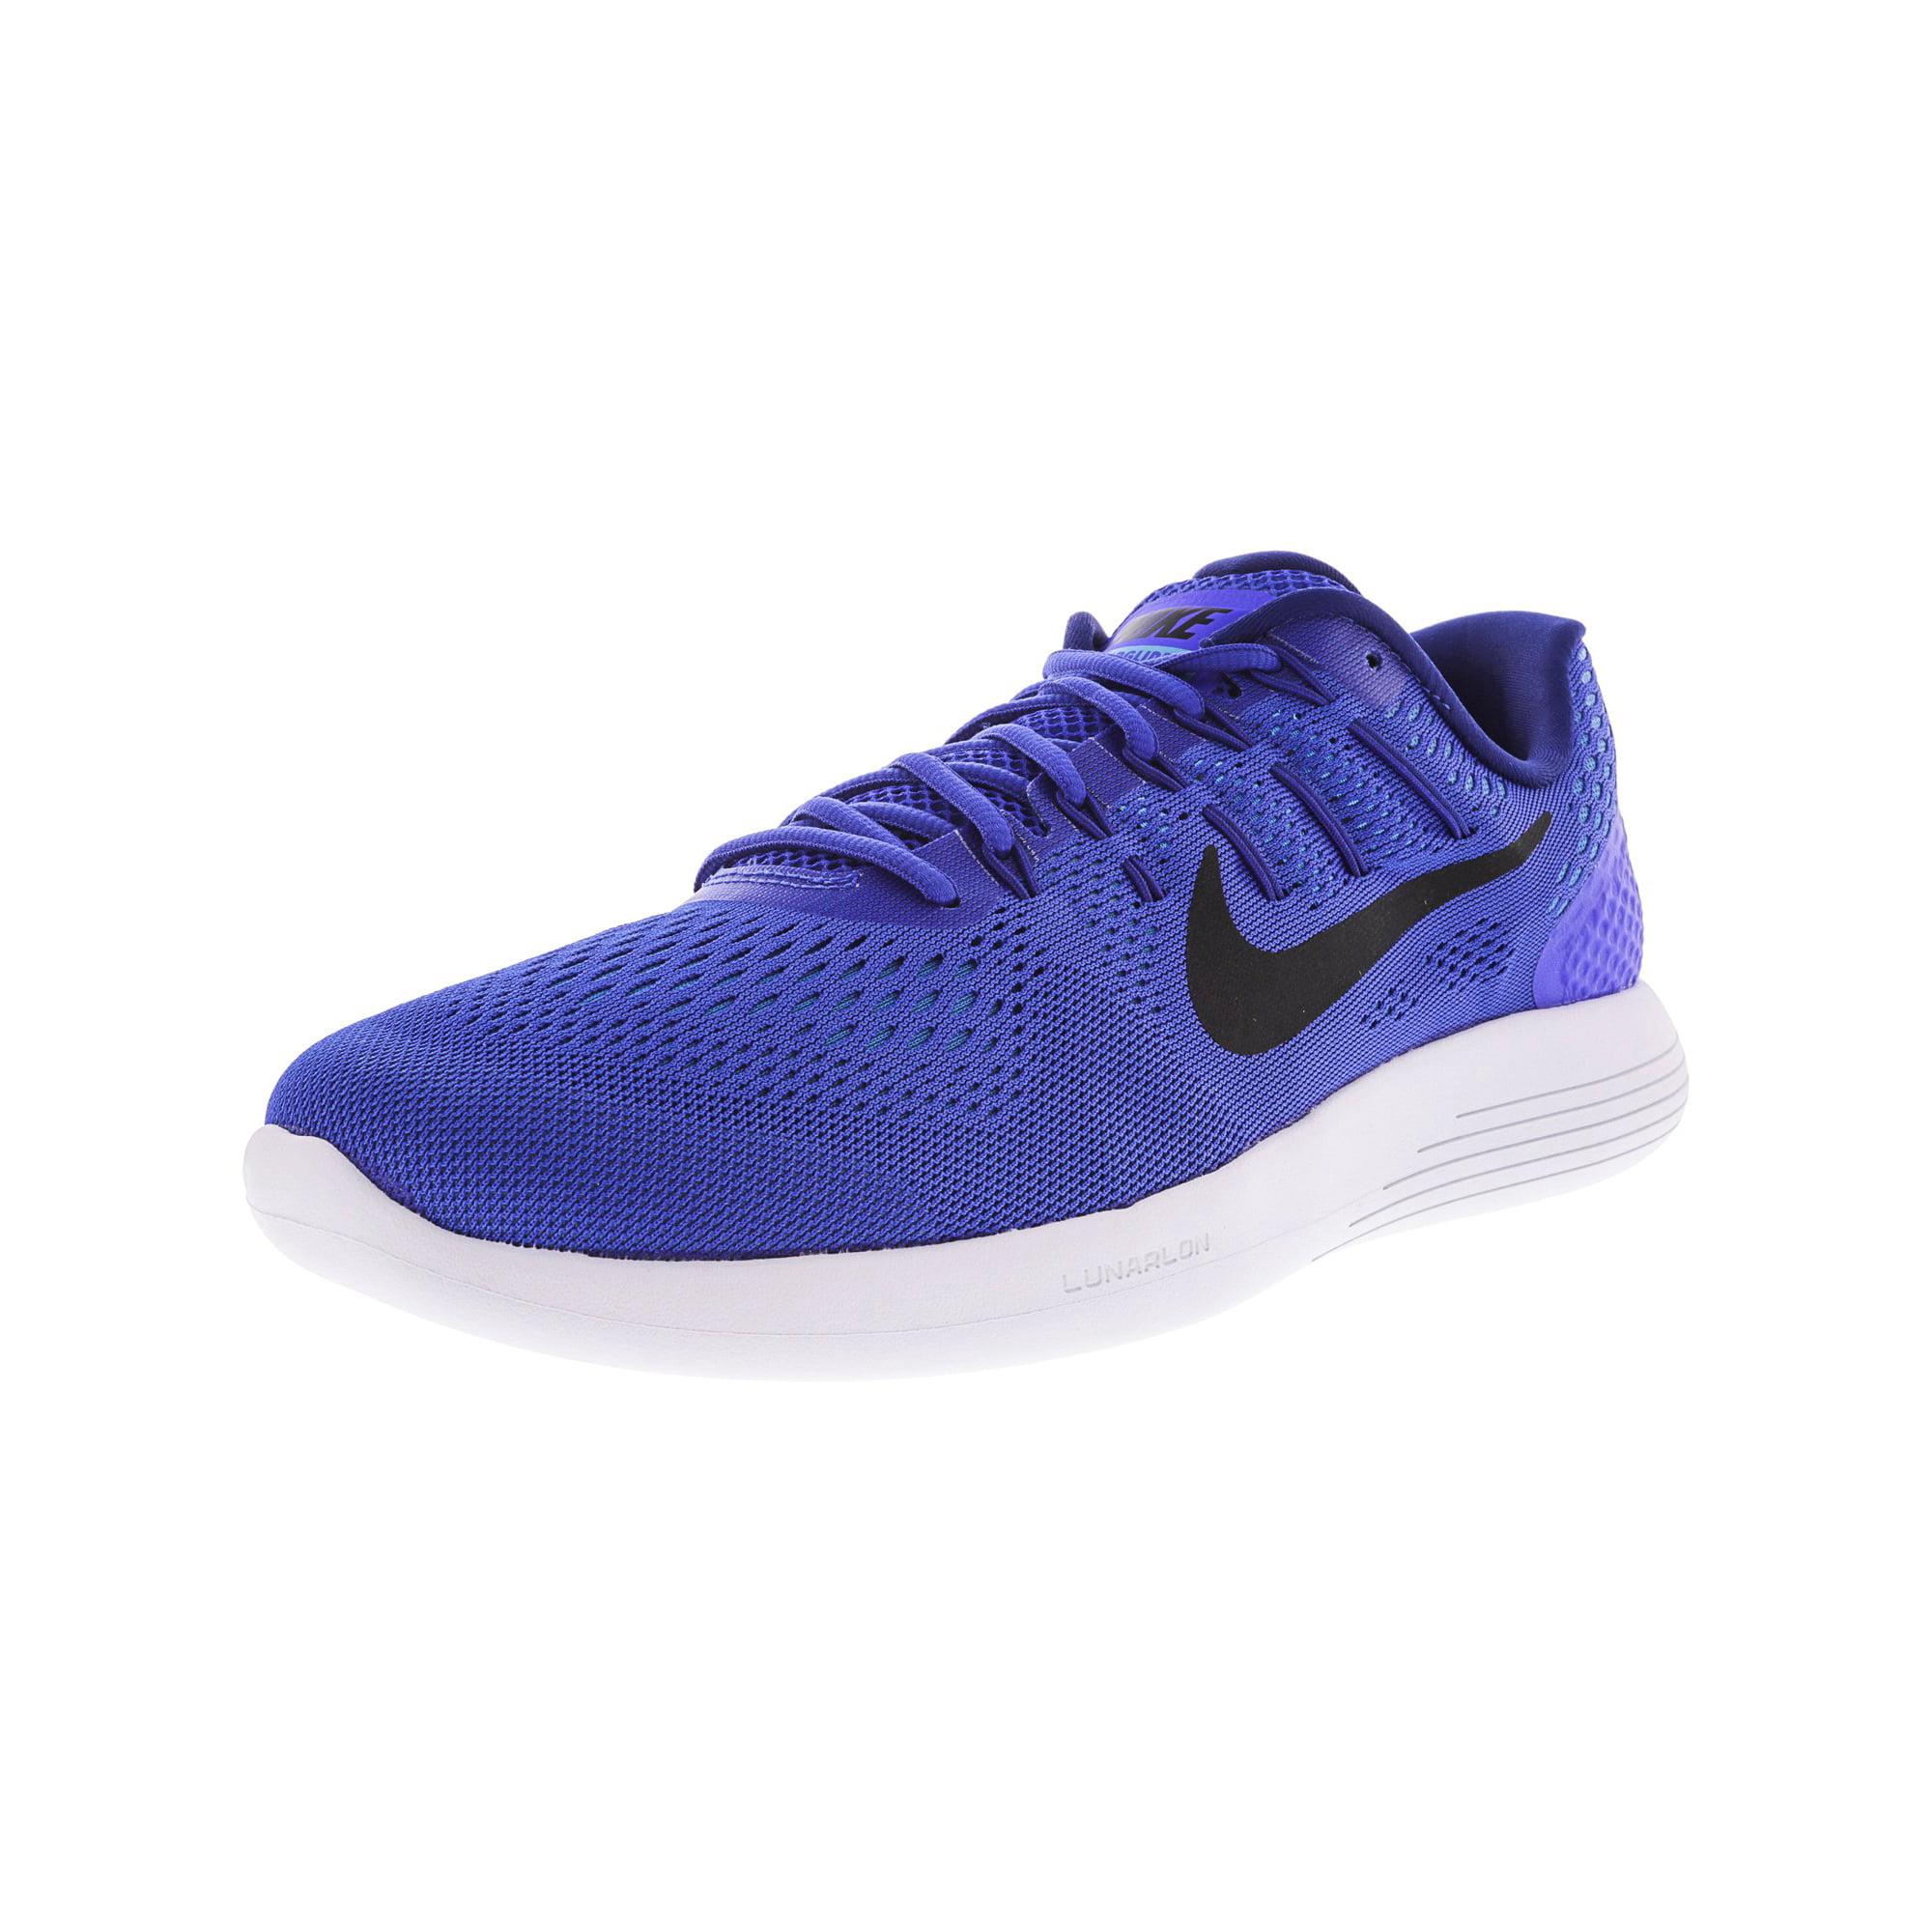 competitive price 1ad14 fc084 Nike Men's Lunarglide 8 Racer Blue / Black Ankle-High ...